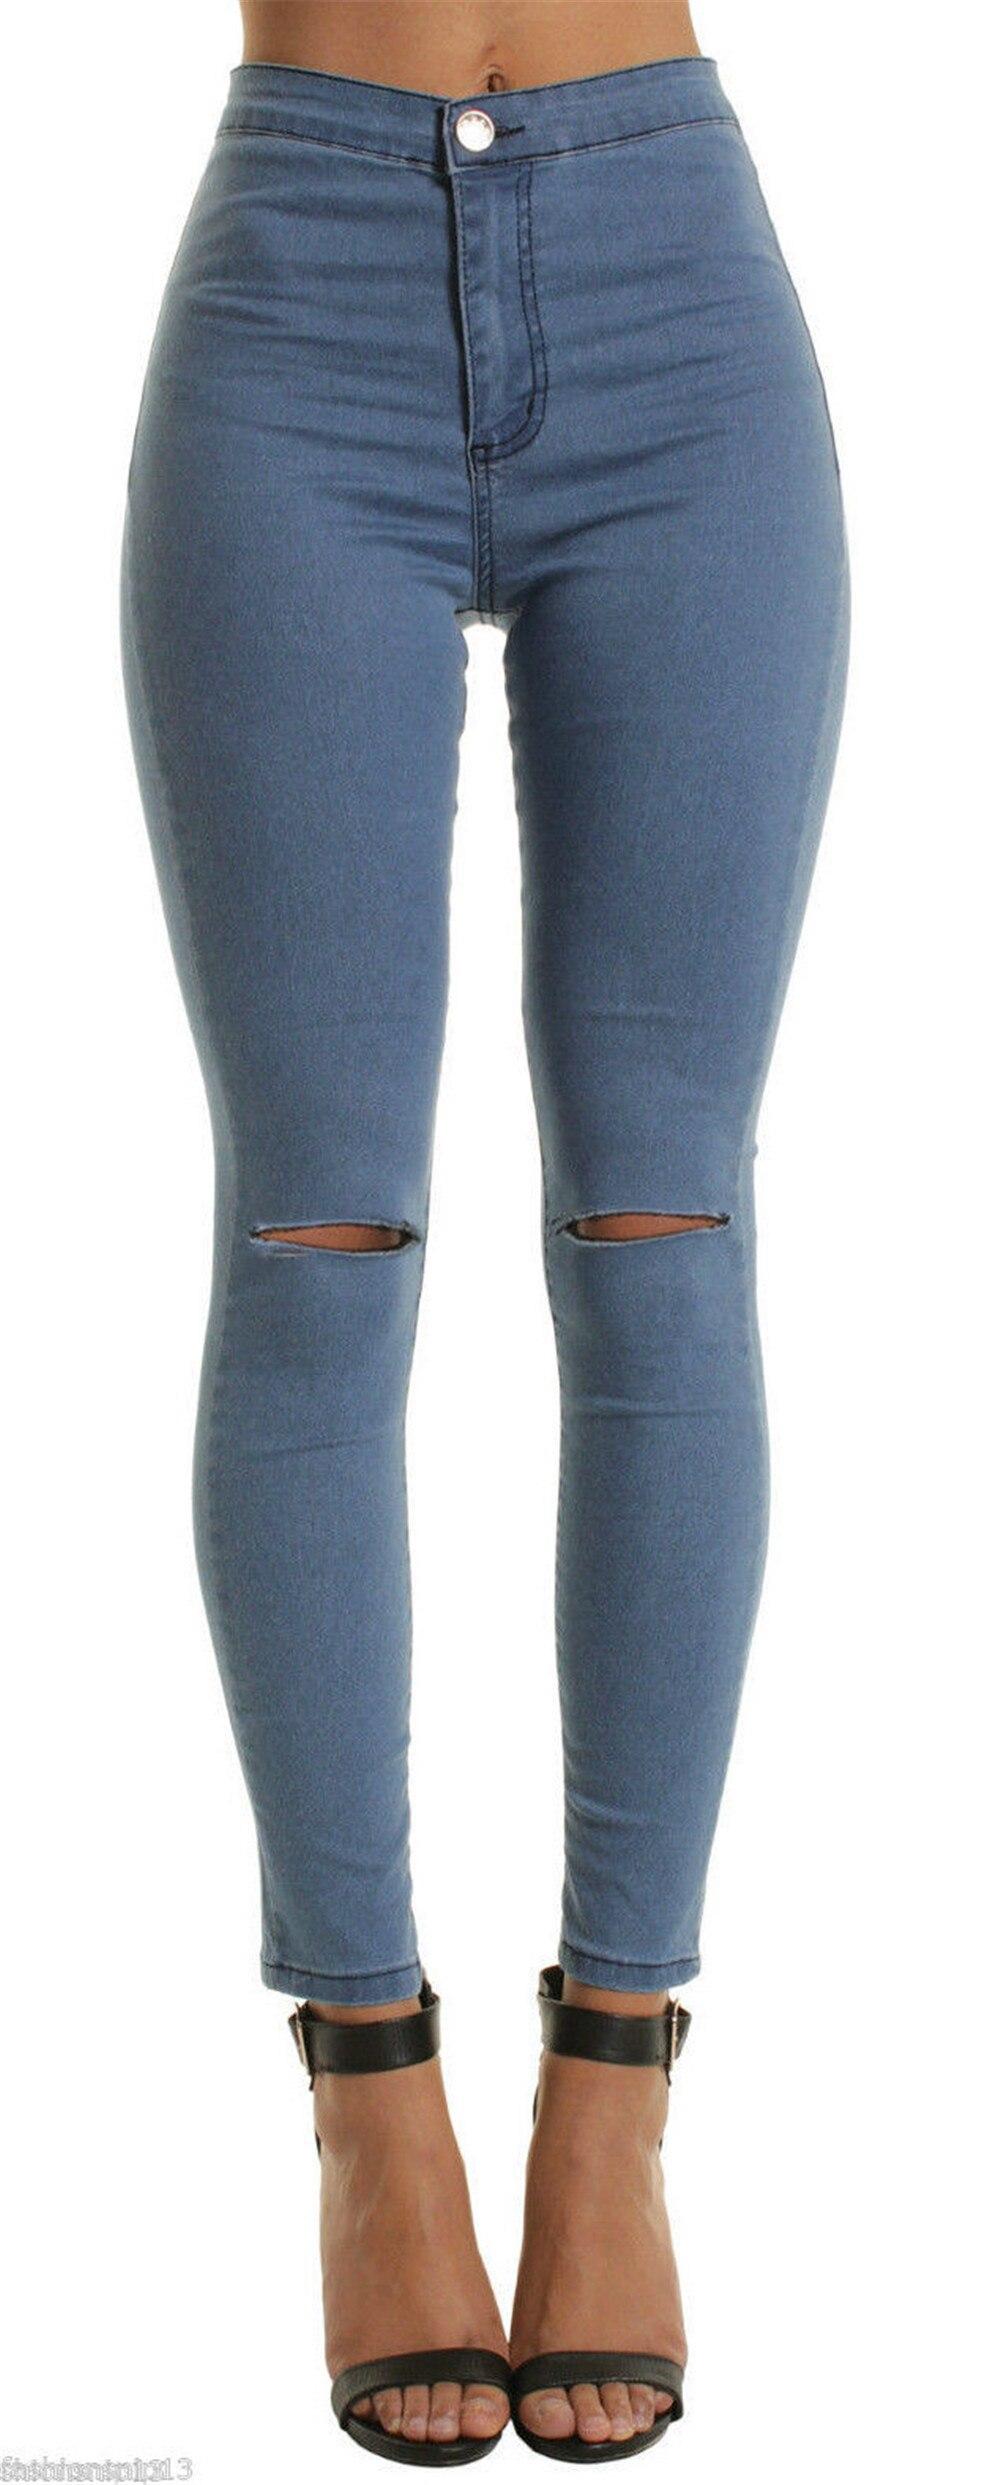 Female Ladies Hot Girls Slim Jeans Fashion